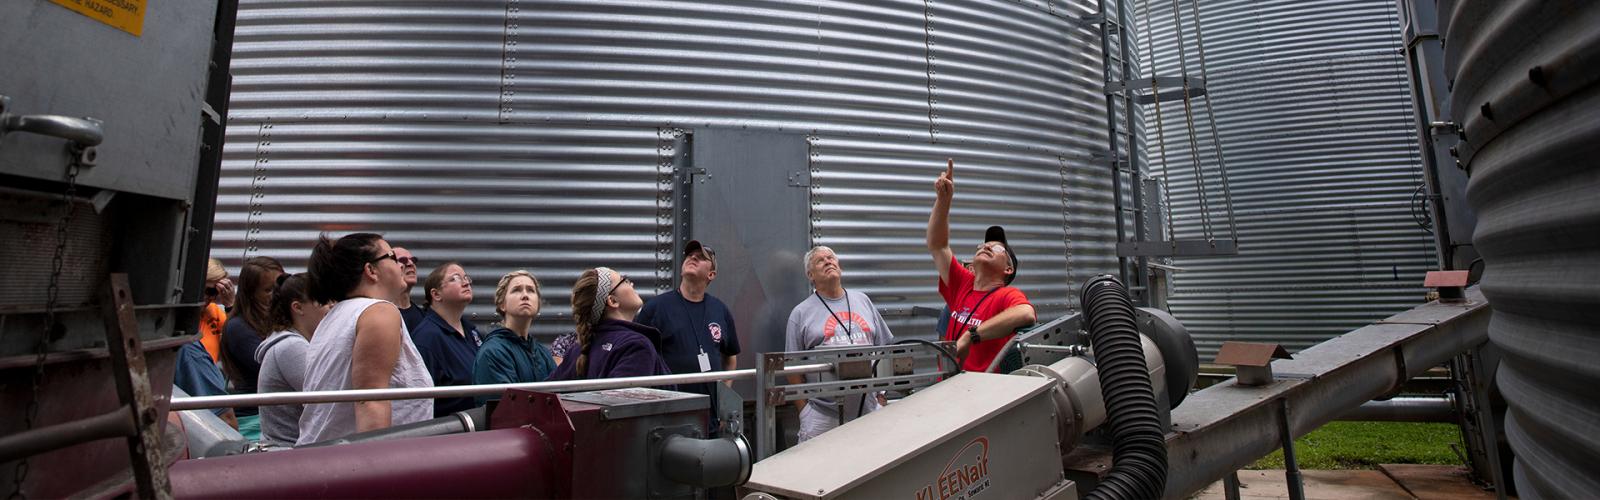 Jeff Nelson leading a group through grain bins at the Arlington ARS EMT training